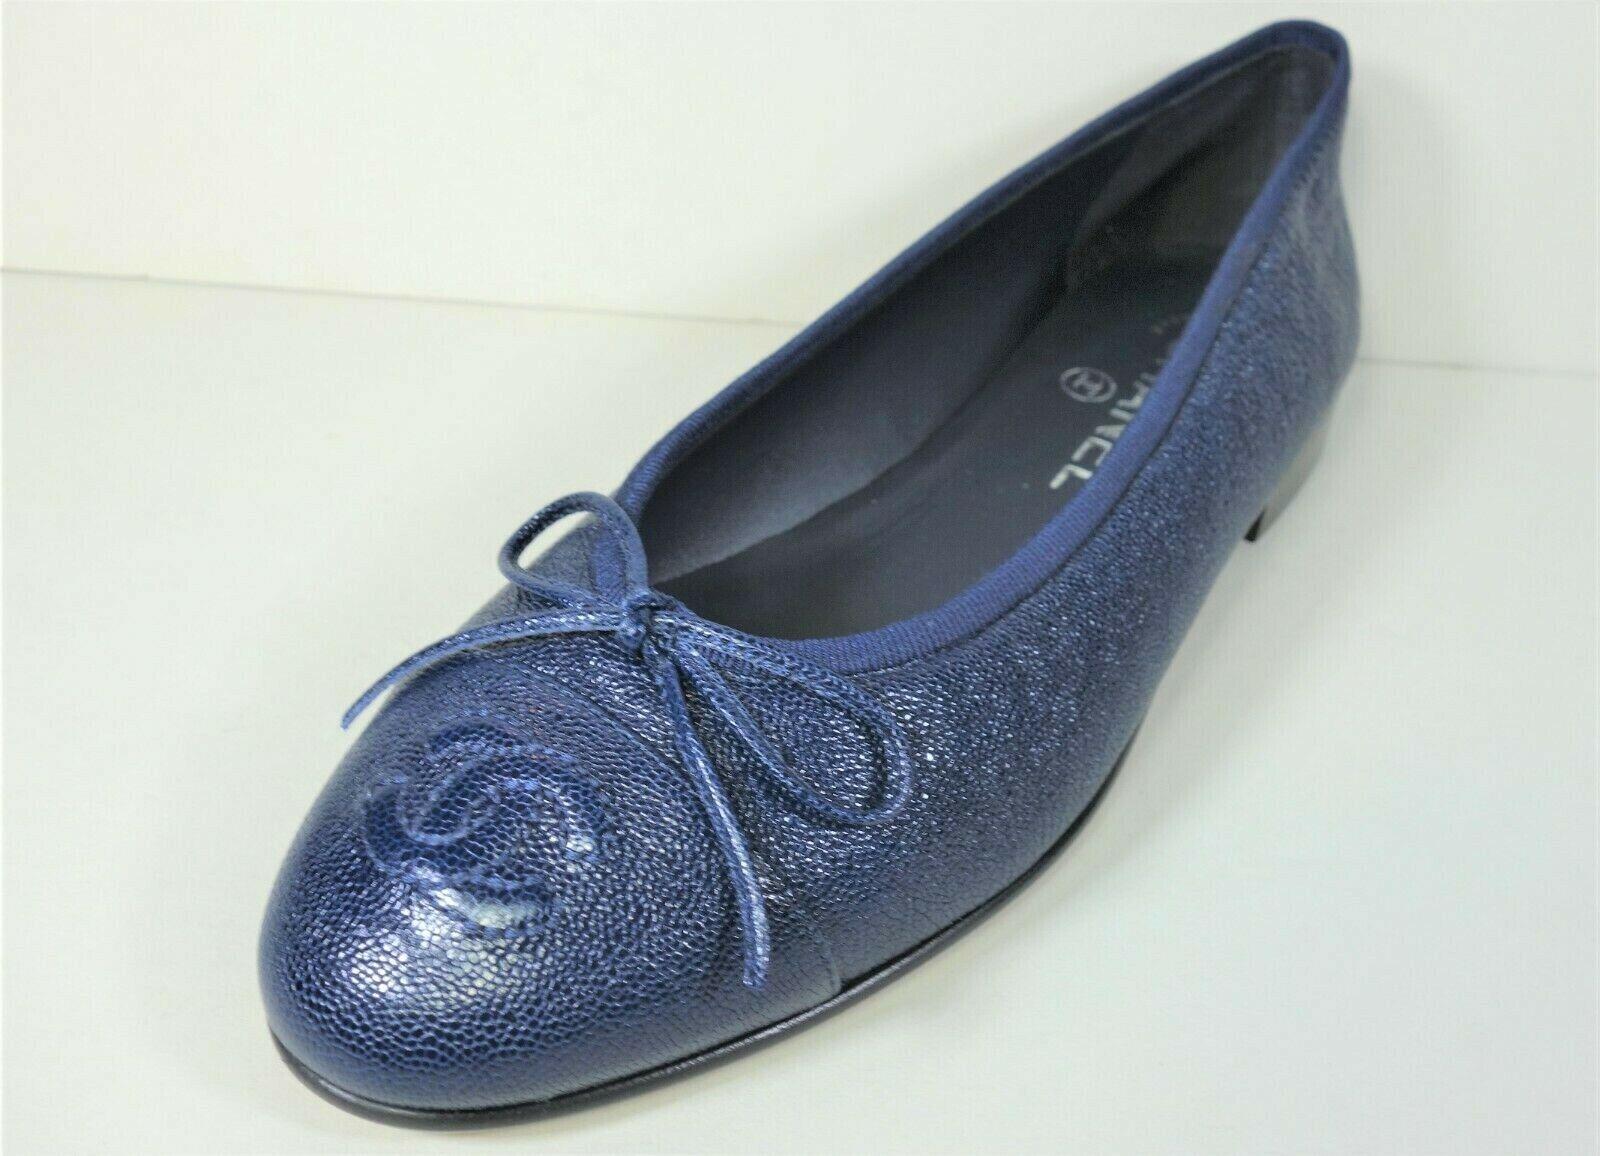 CHANEL 36 navy grained lambskin ballet ballerina flats cap round toe CC NEW